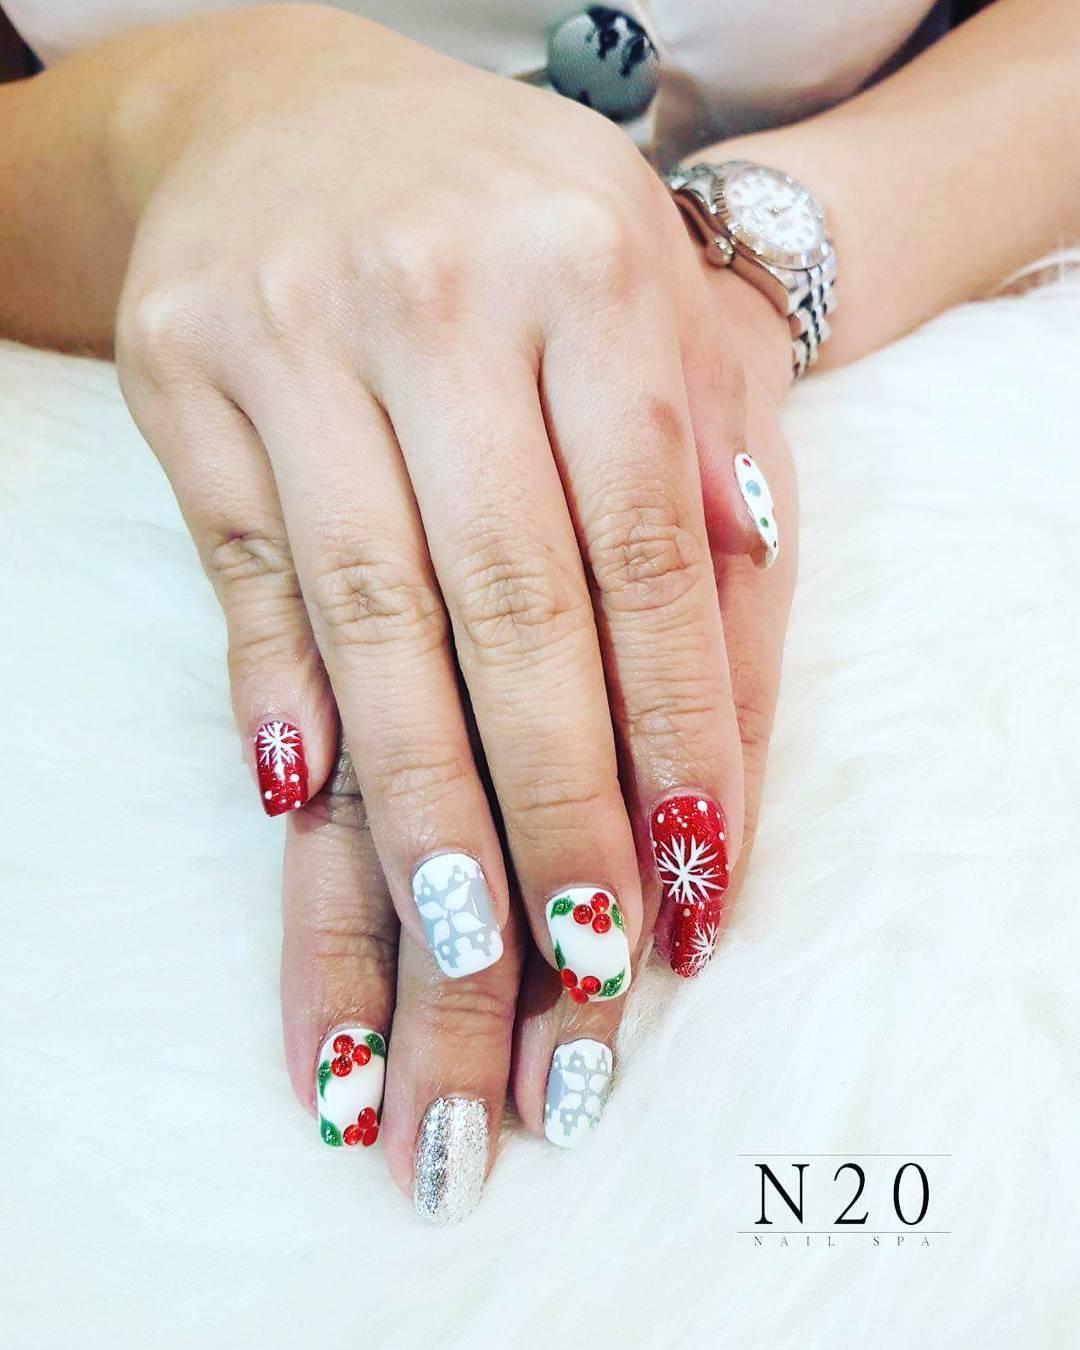 Red White Christmas Manicure Nail Art N20 Nail Spa